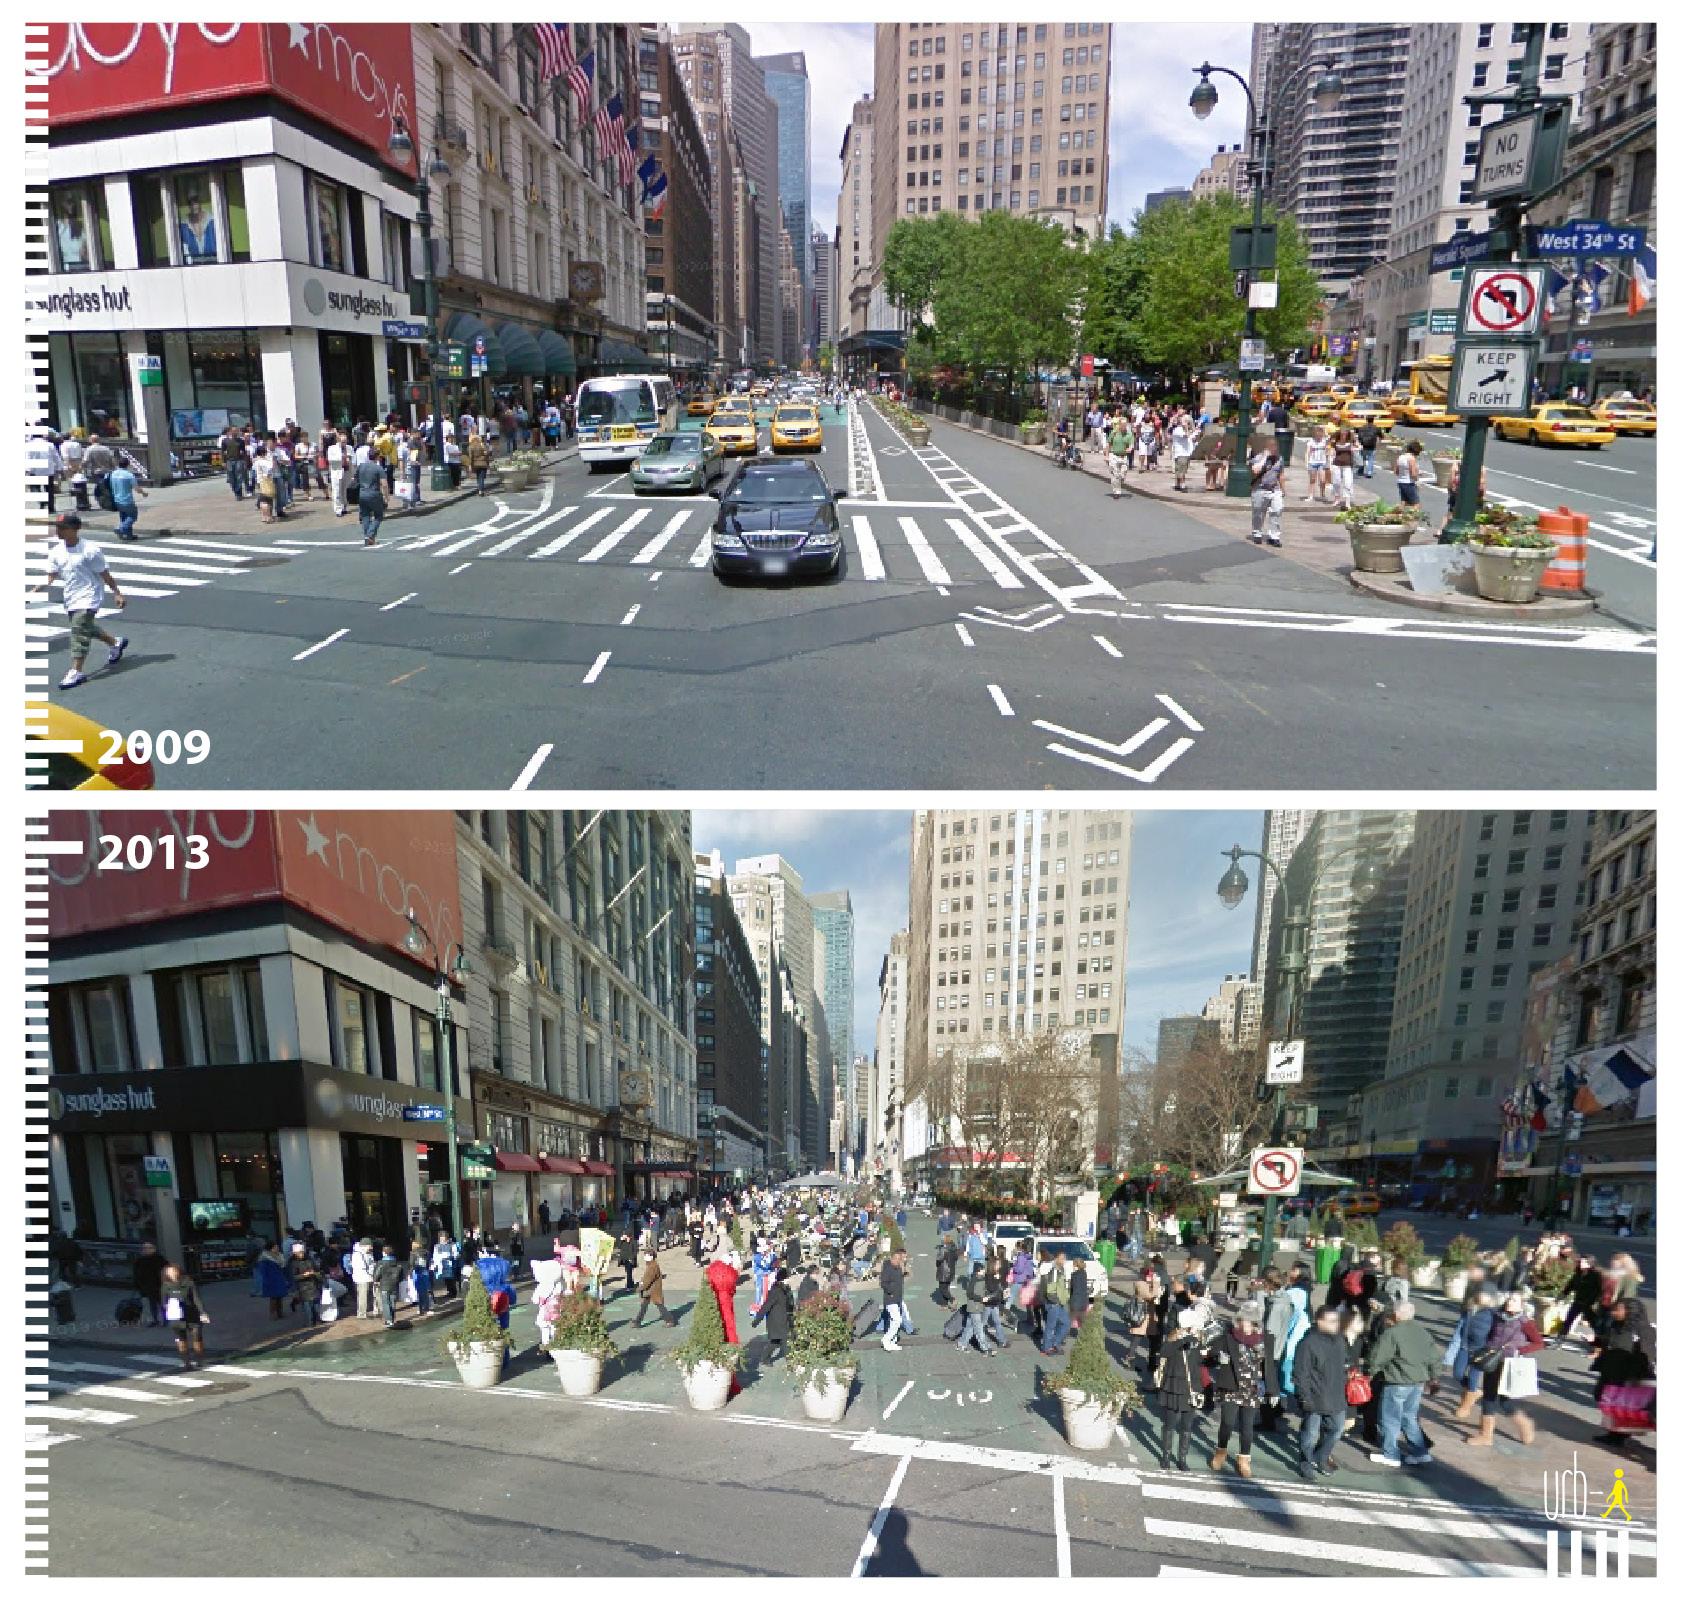 0162 US New York Herald Square - W34